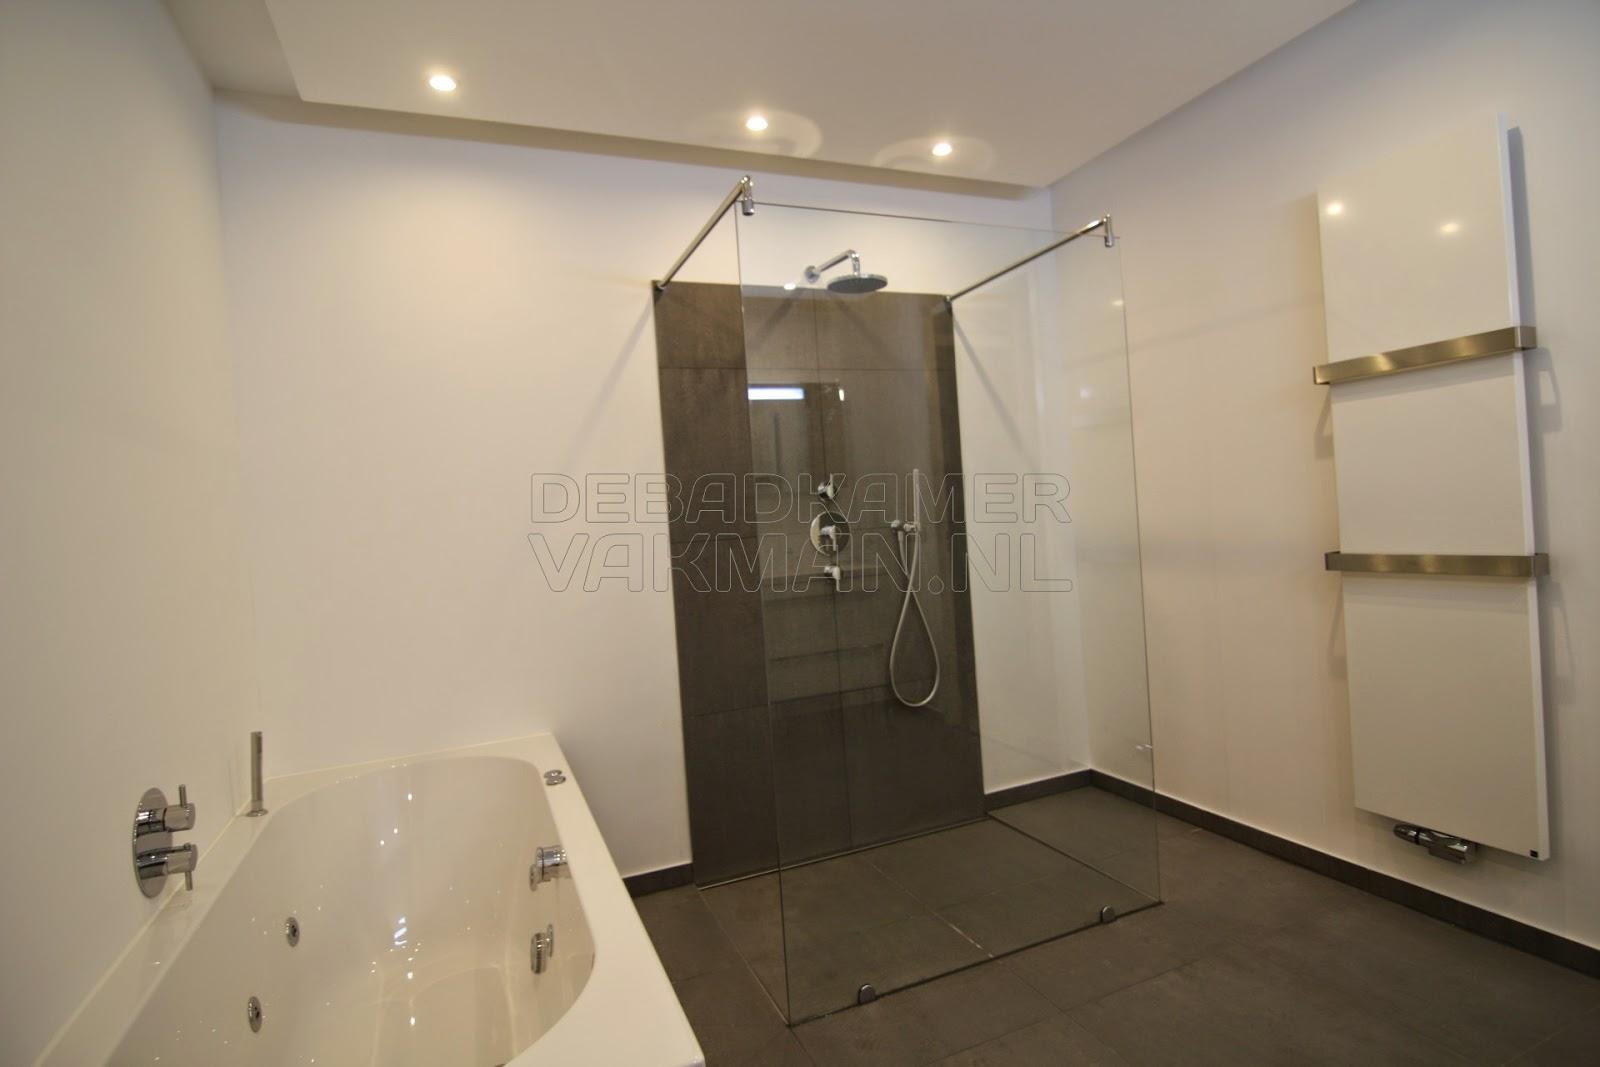 Badkamer ideeen plattegrond - Moderne design badkamer ...